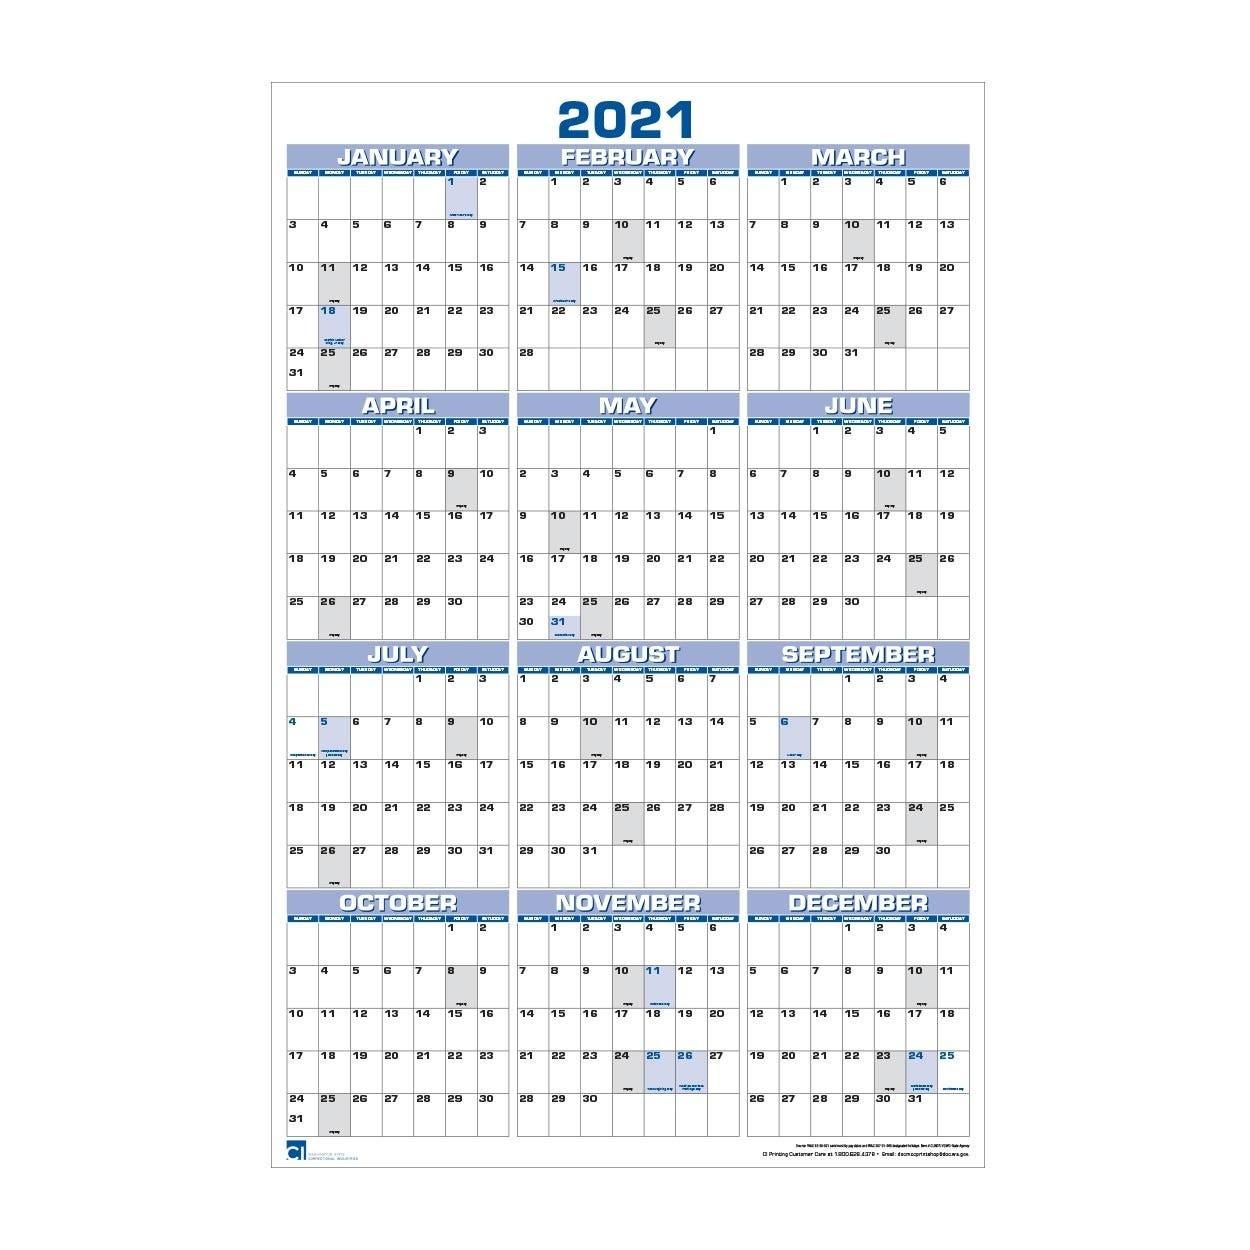 2021 Large Wall Calendar, Year At A Glance (#Clndr-Ygwc-Large Print 2021 Calendar At A Glance Printable